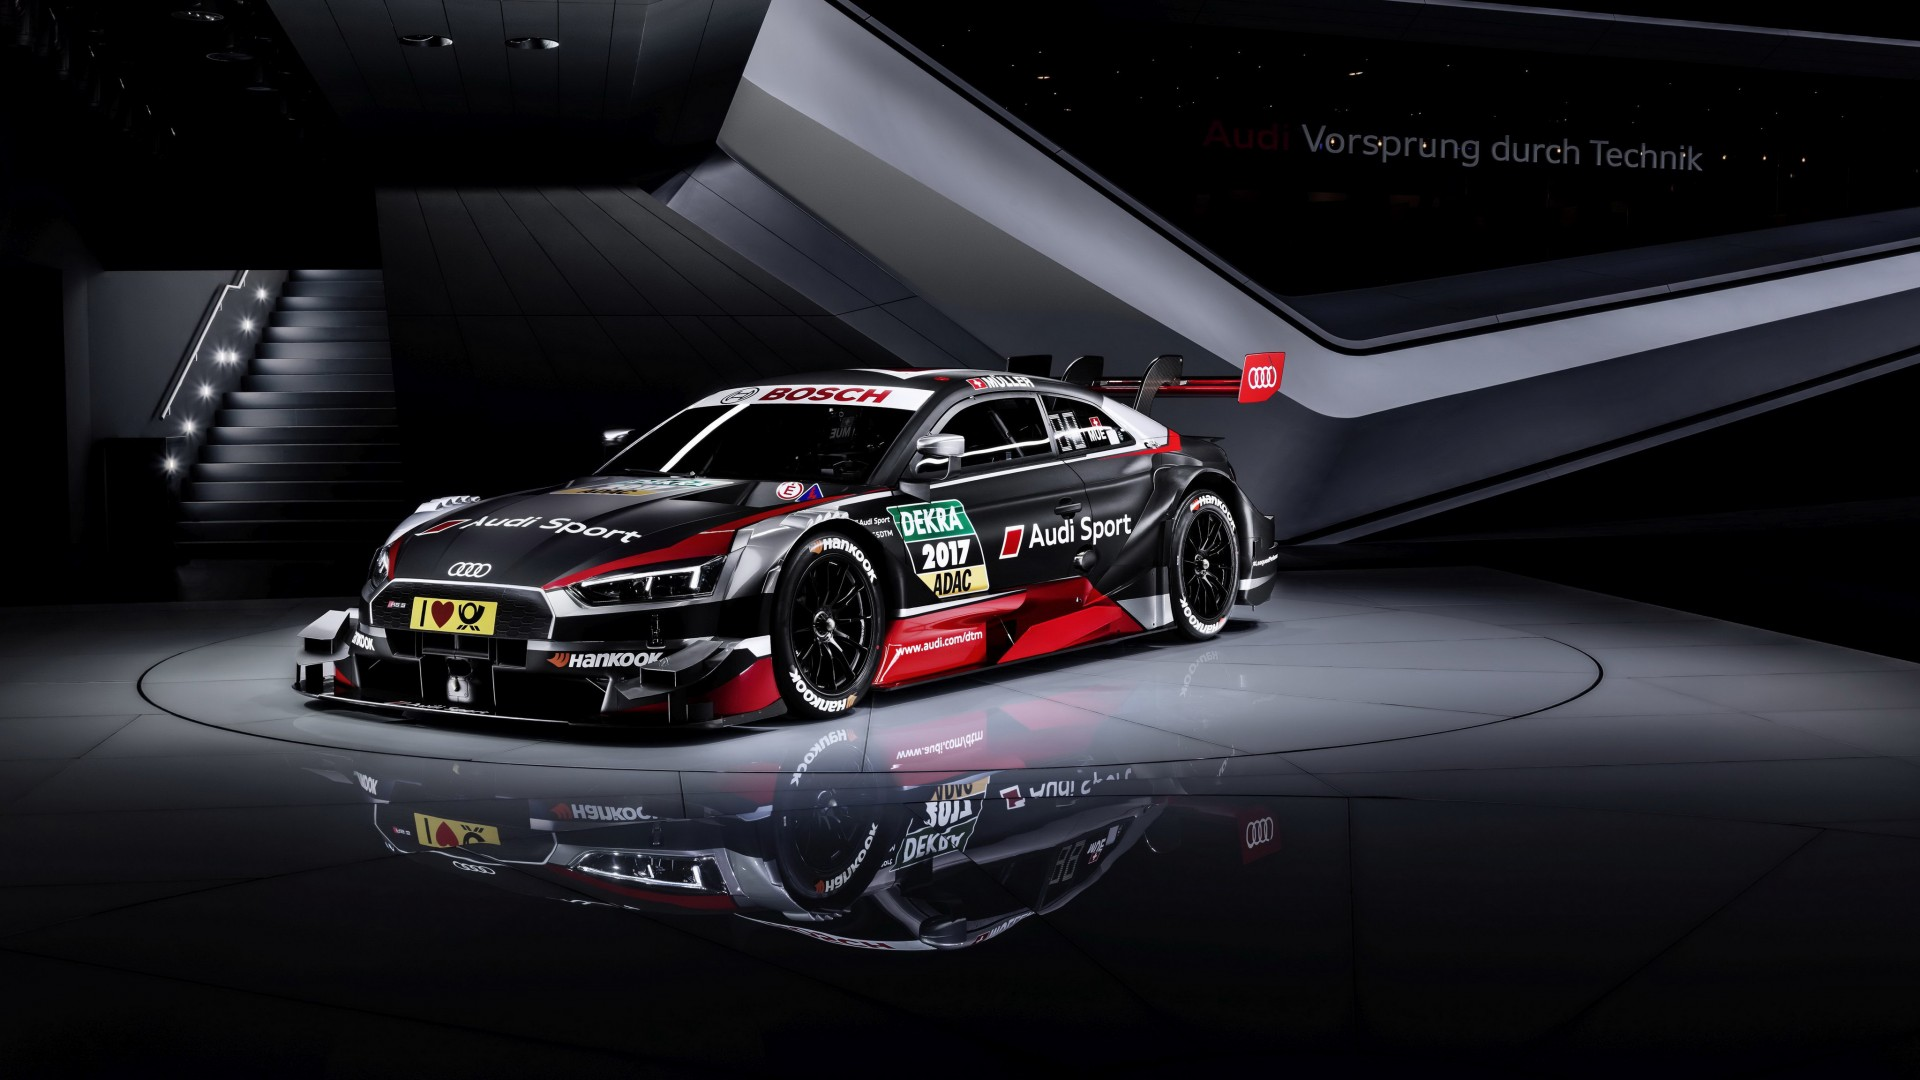 Audi RS 5 Coupe DTM Wallpaper   Wallpaper Stream 1920x1080